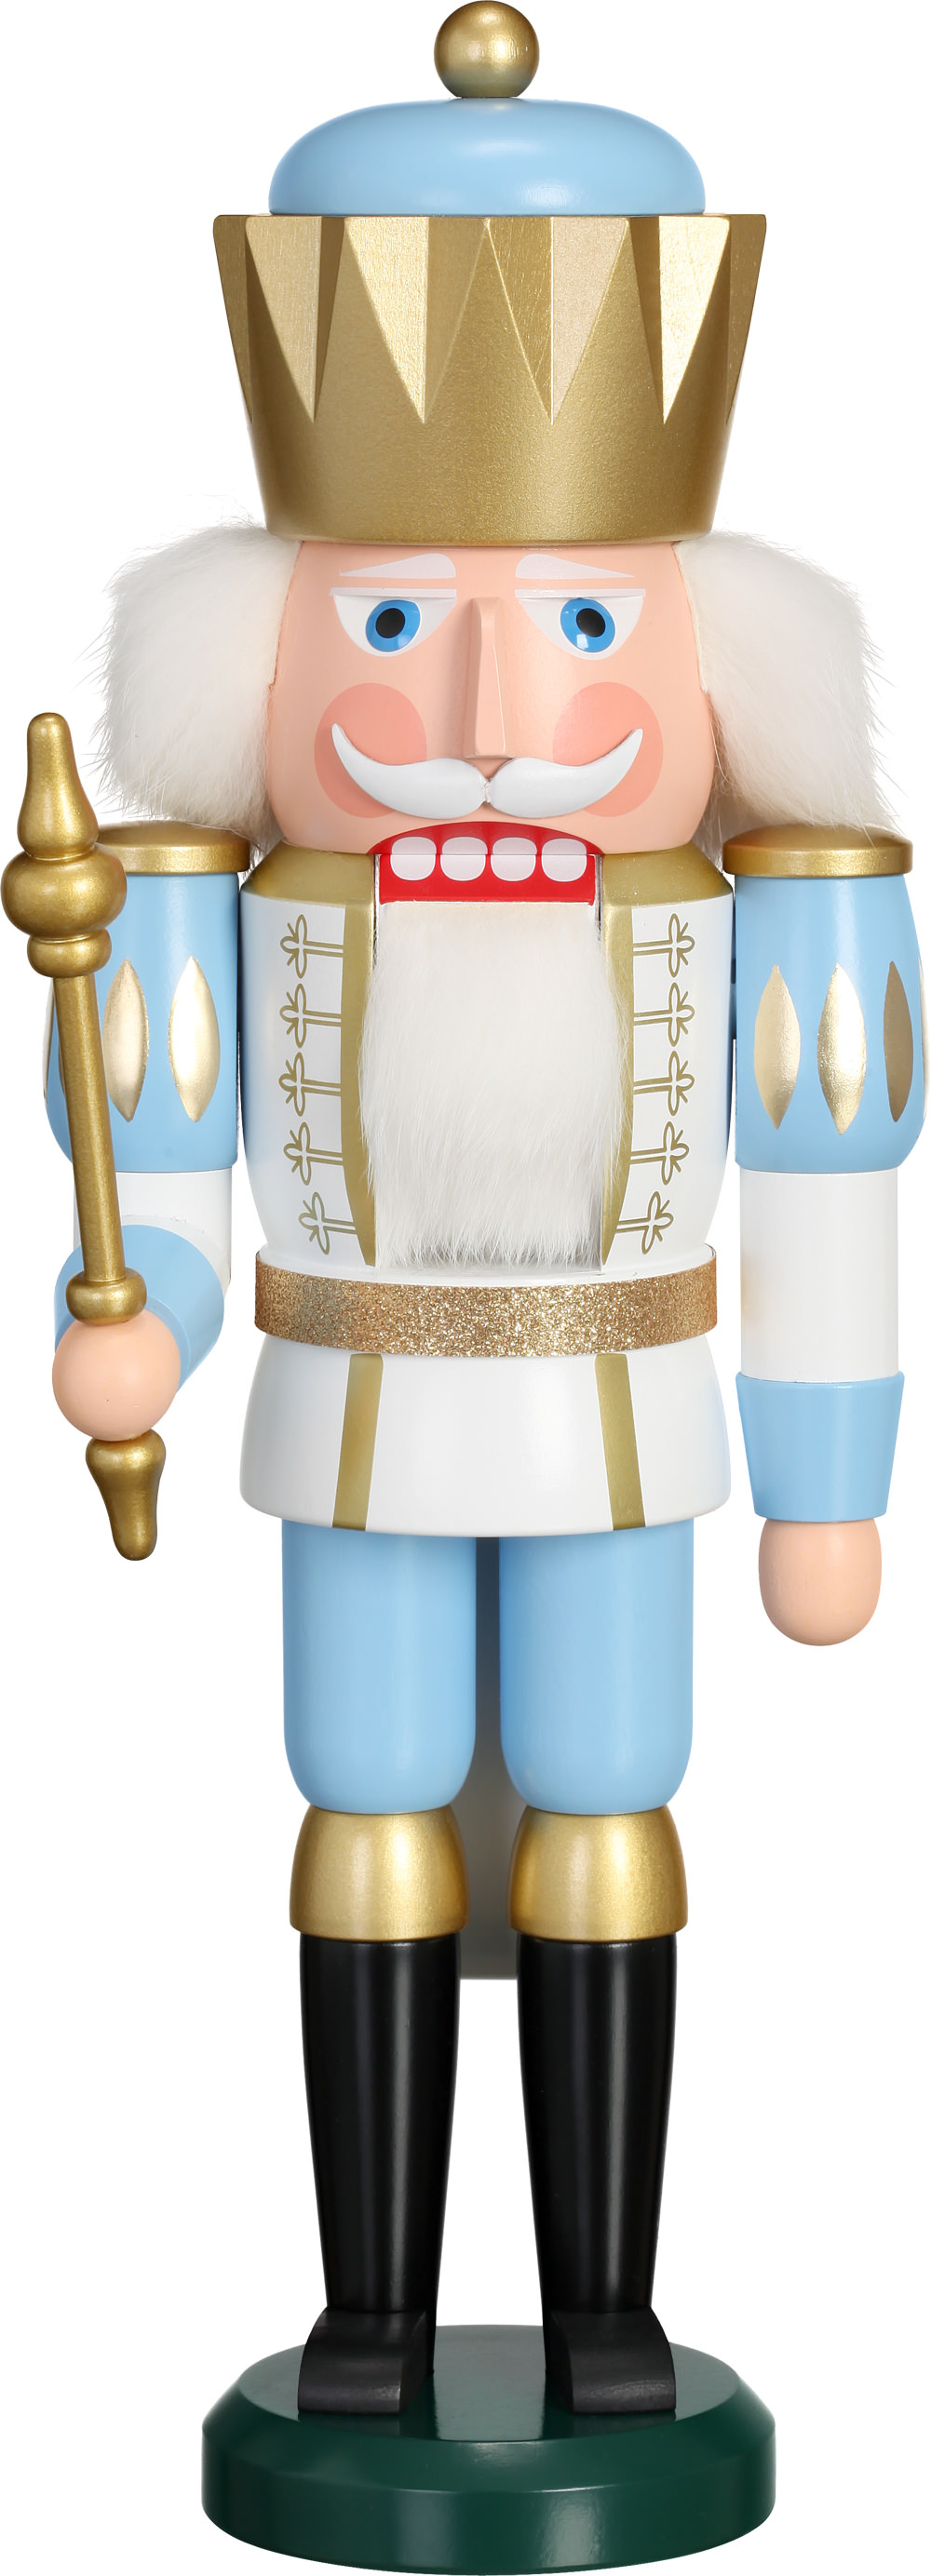 Nussknacker König, weiß-blau